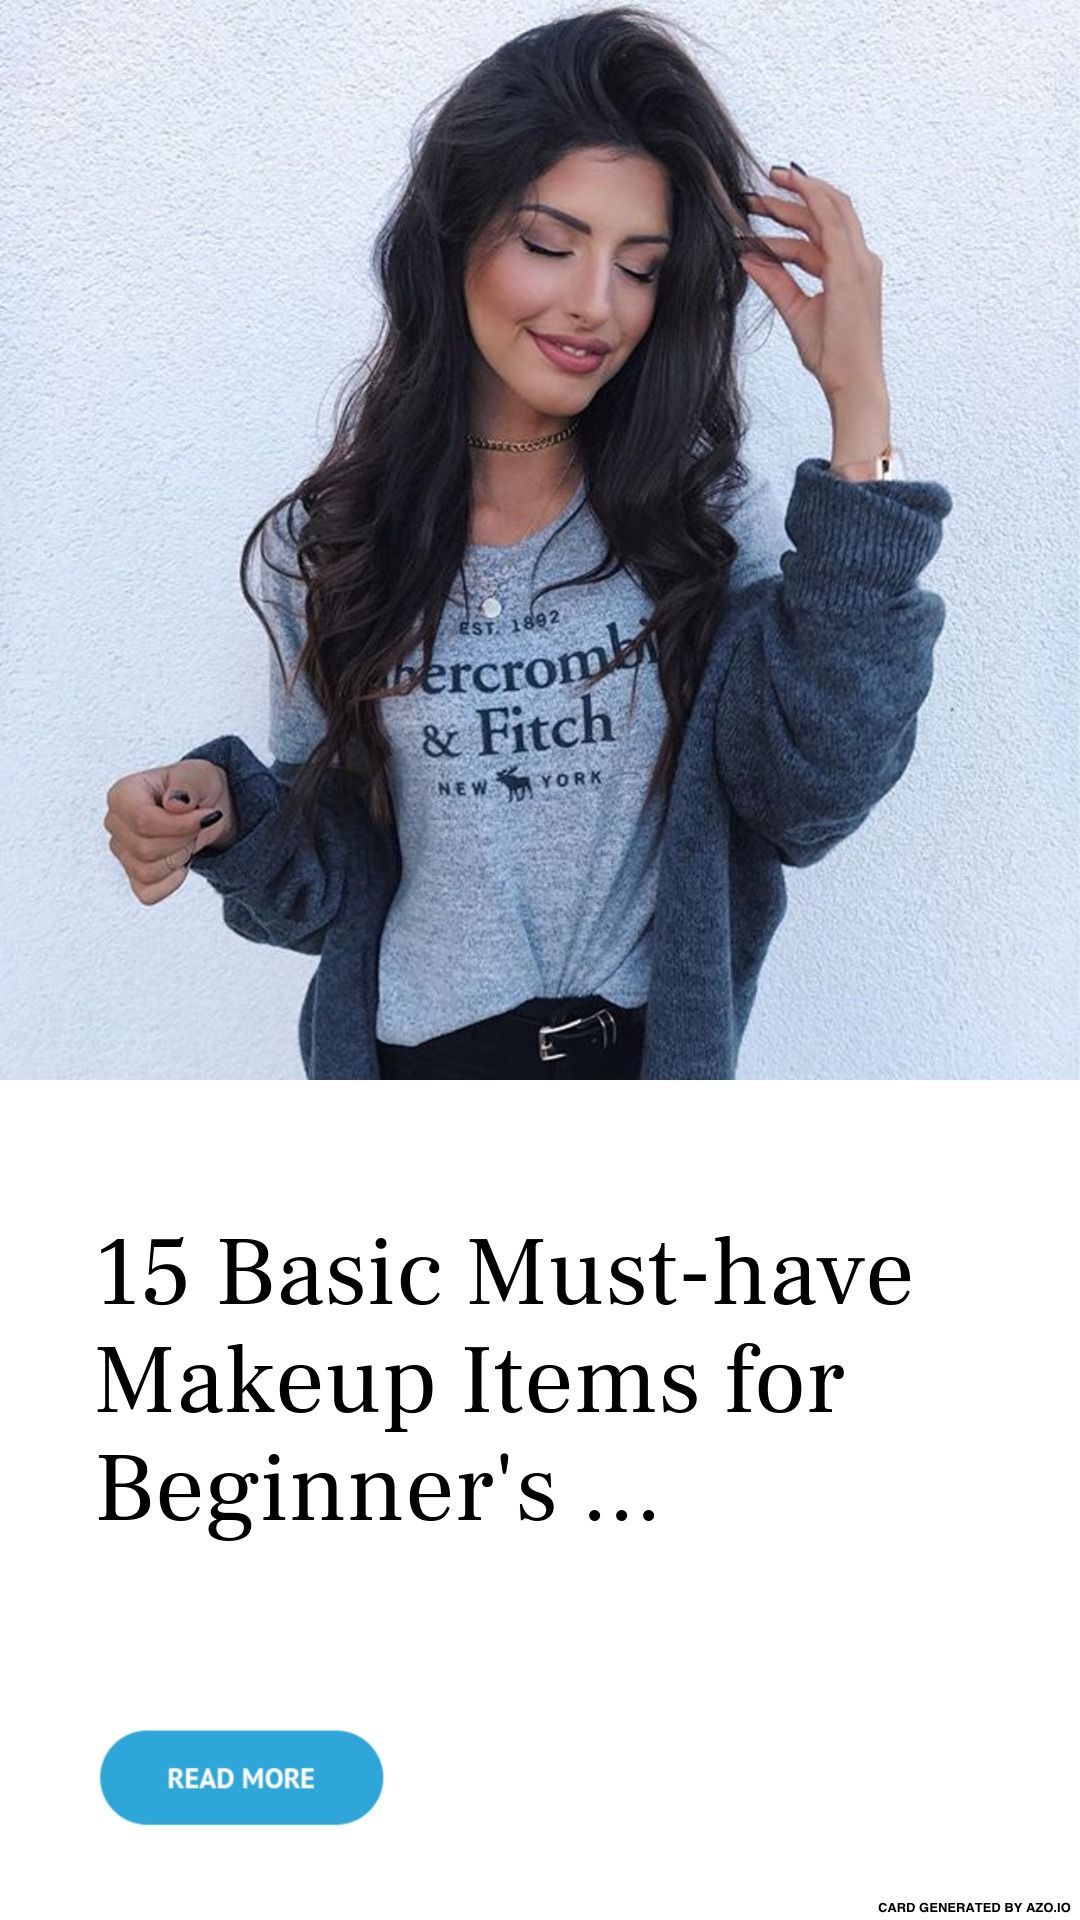 15 Basic Musthave Makeup Items for Beginner's Basic